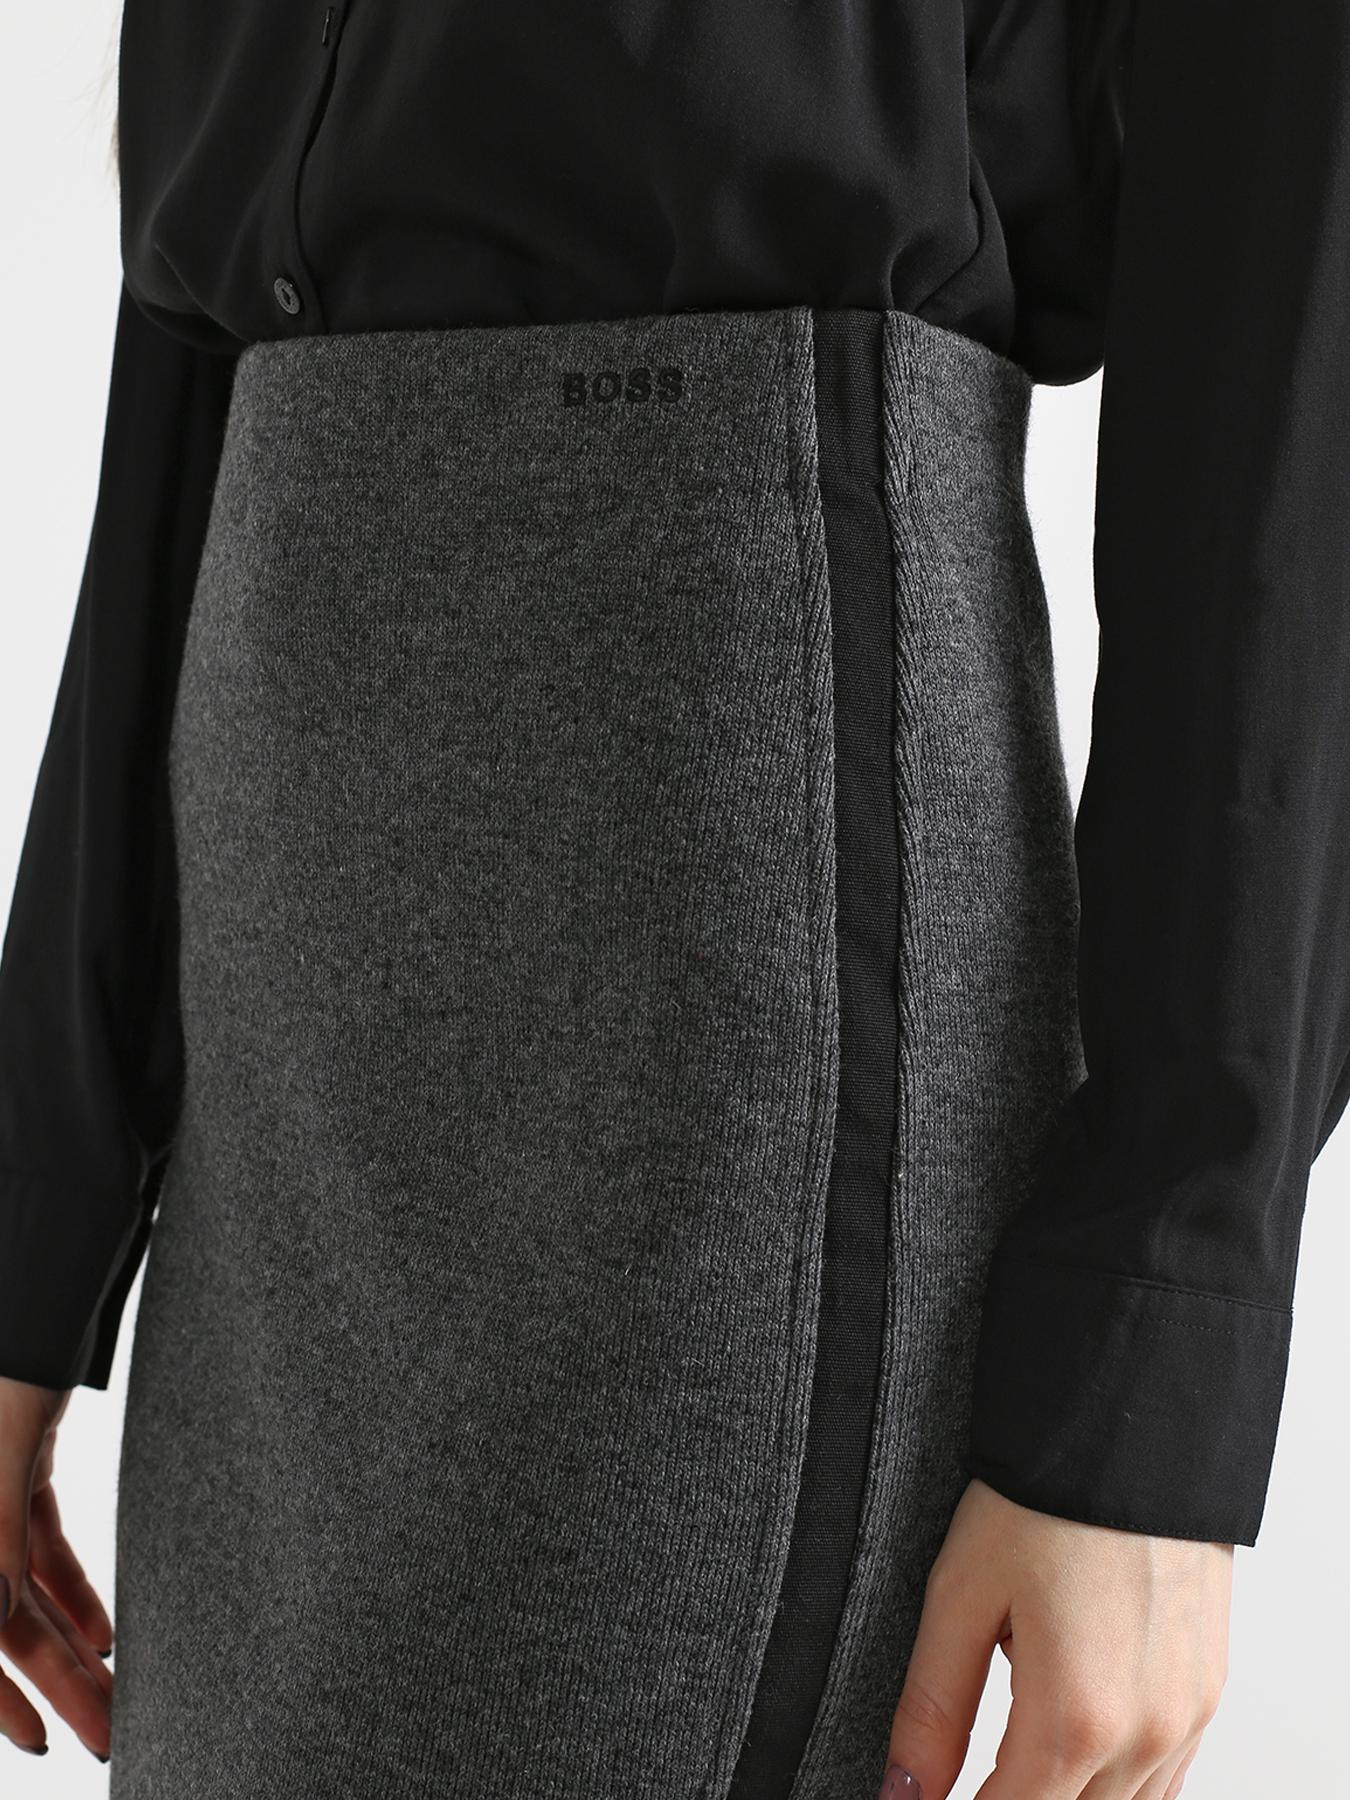 BOSS Женская юбка Tighty 357906-041 Фото 3